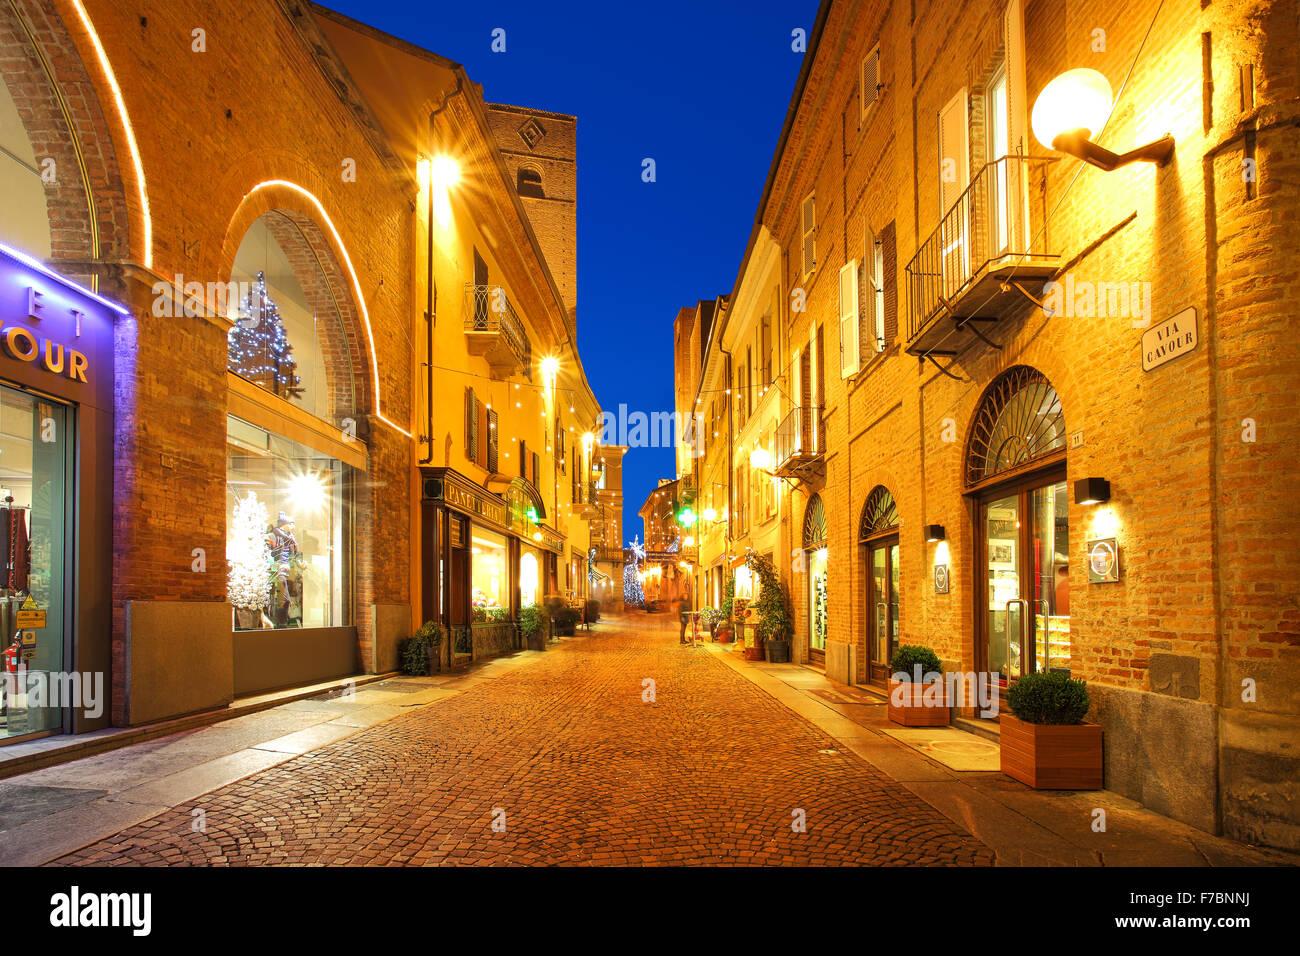 Popular tourist street in historic center of Alba, Italy. - Stock Image